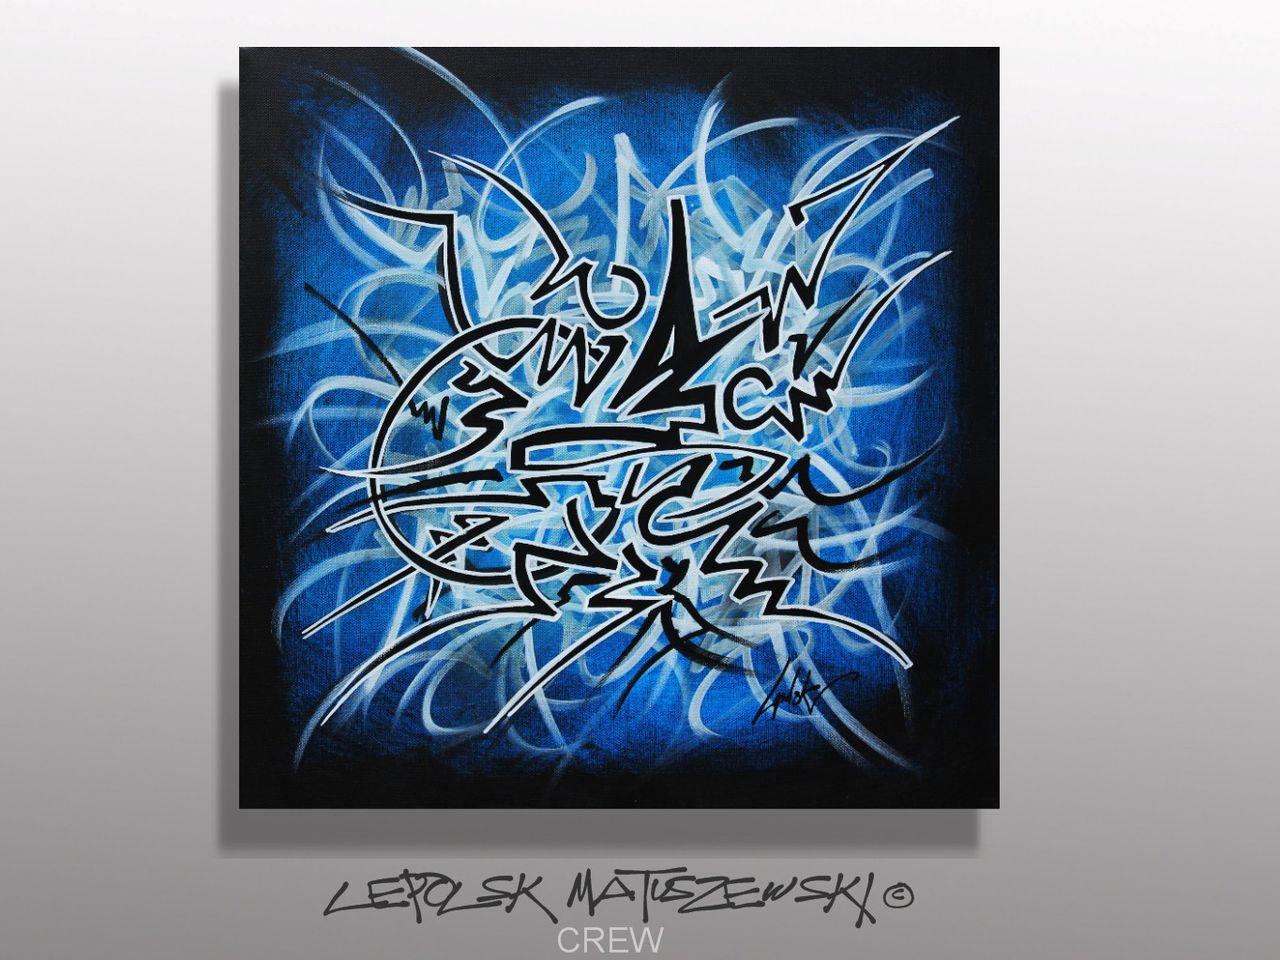 MK  Lepolsk Matuszewski CREW   street art calligraffiti graffiti abstrait